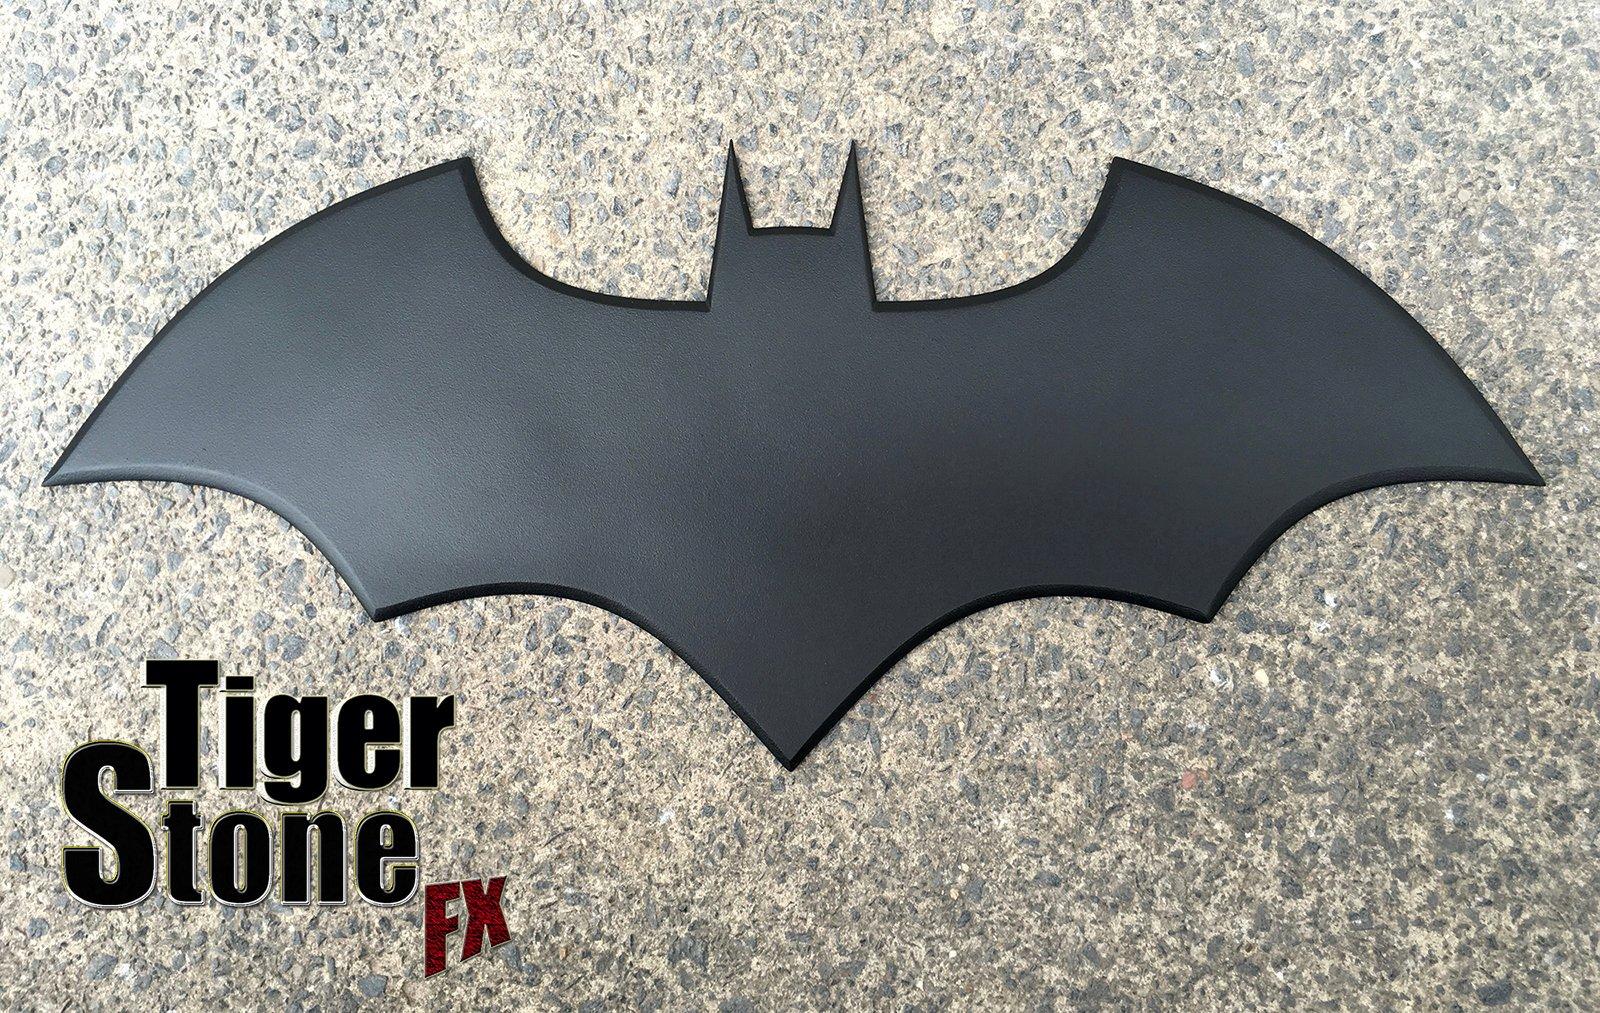 Batman Chest Emblem Unique New 52 Batman Inspired Chest Emblem Tiger Stone Fx